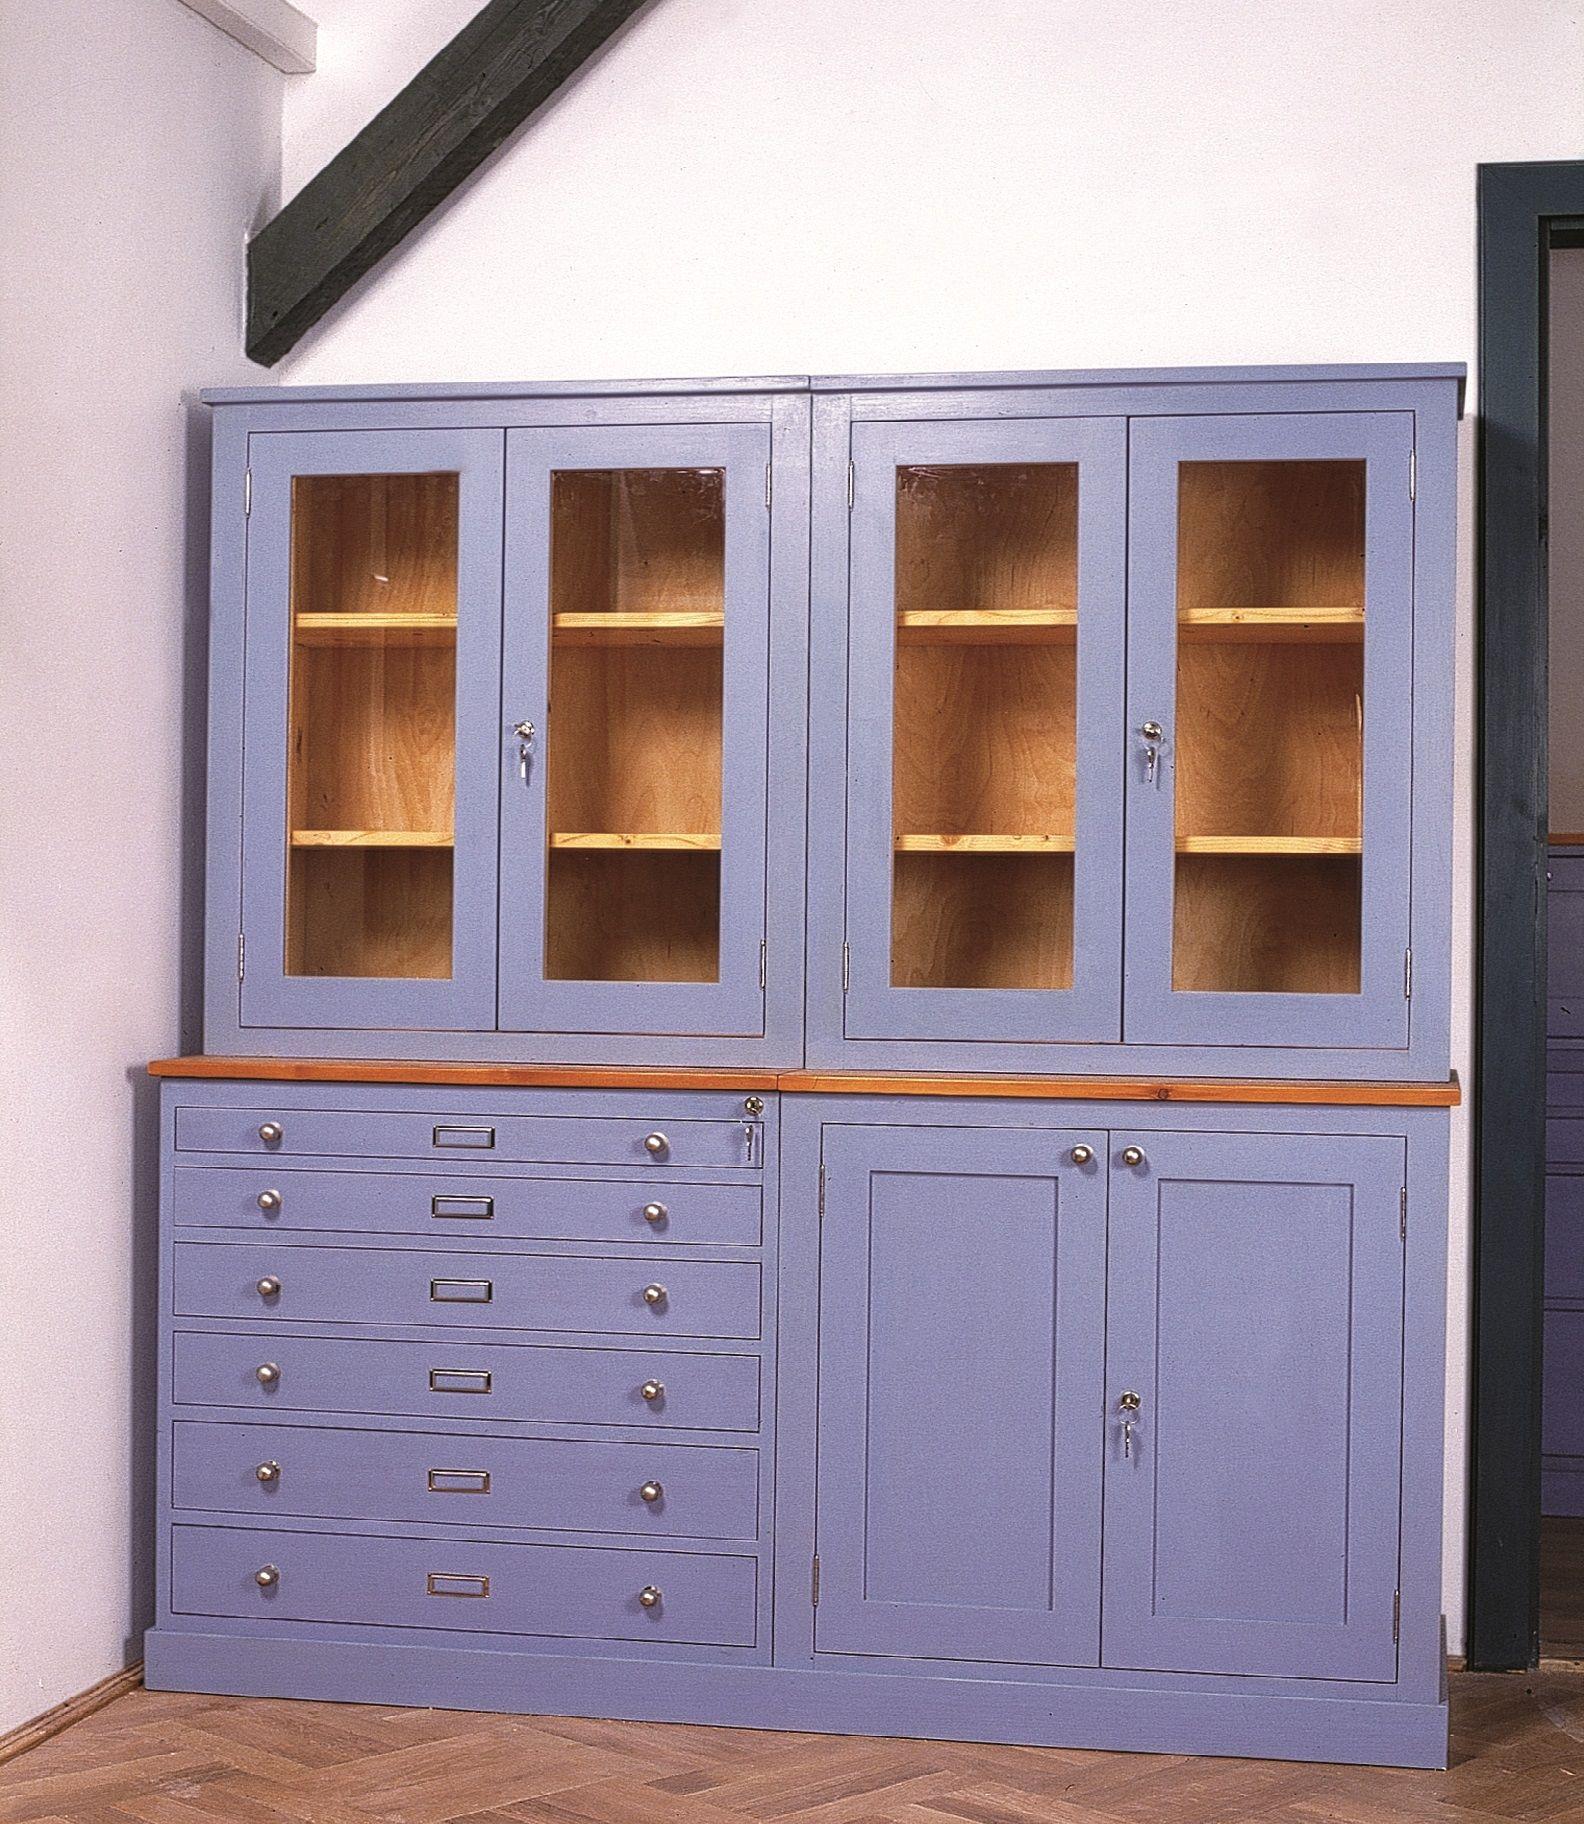 Duna Museum Wall Cabinet.jpg